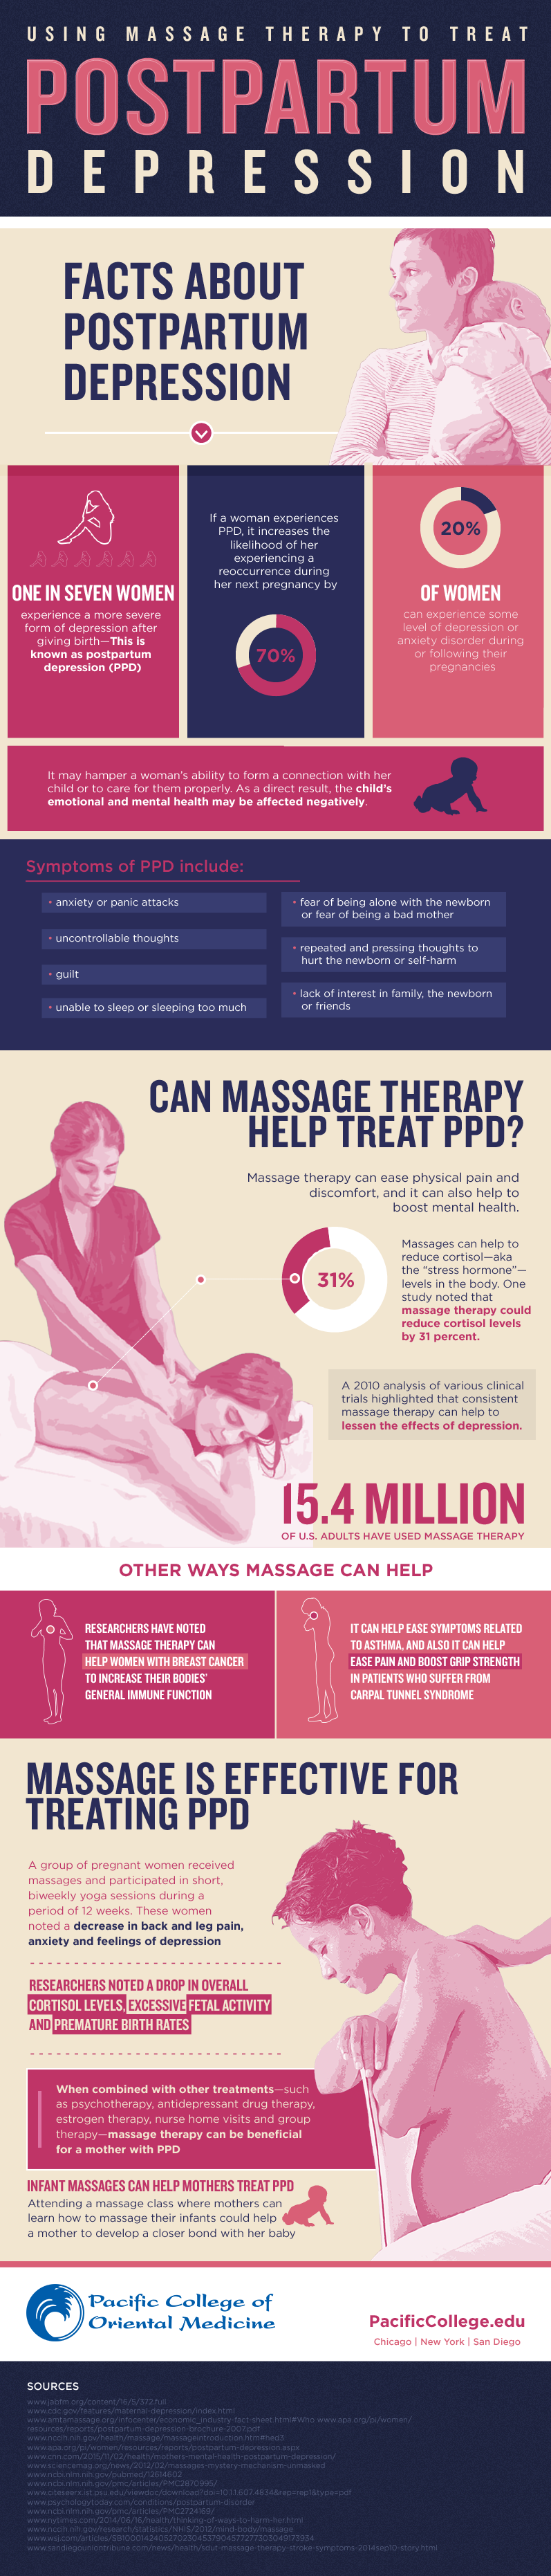 Using Massage Therapy To Treat Postpartum Depression (Infographic)